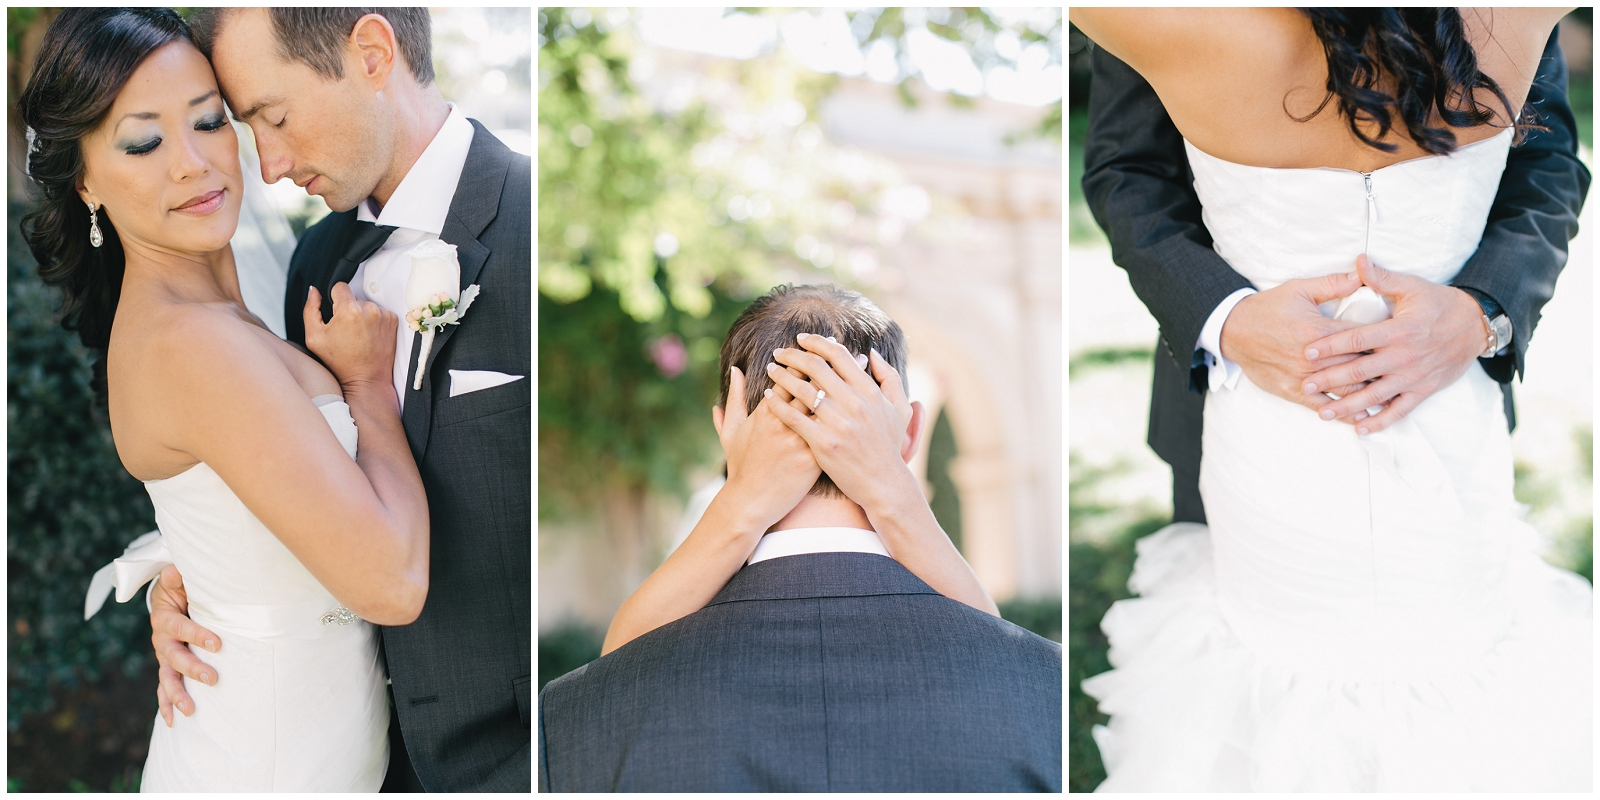 San-Francisco-Bay-Area-Wedding-Photography-Destination-23.jpg